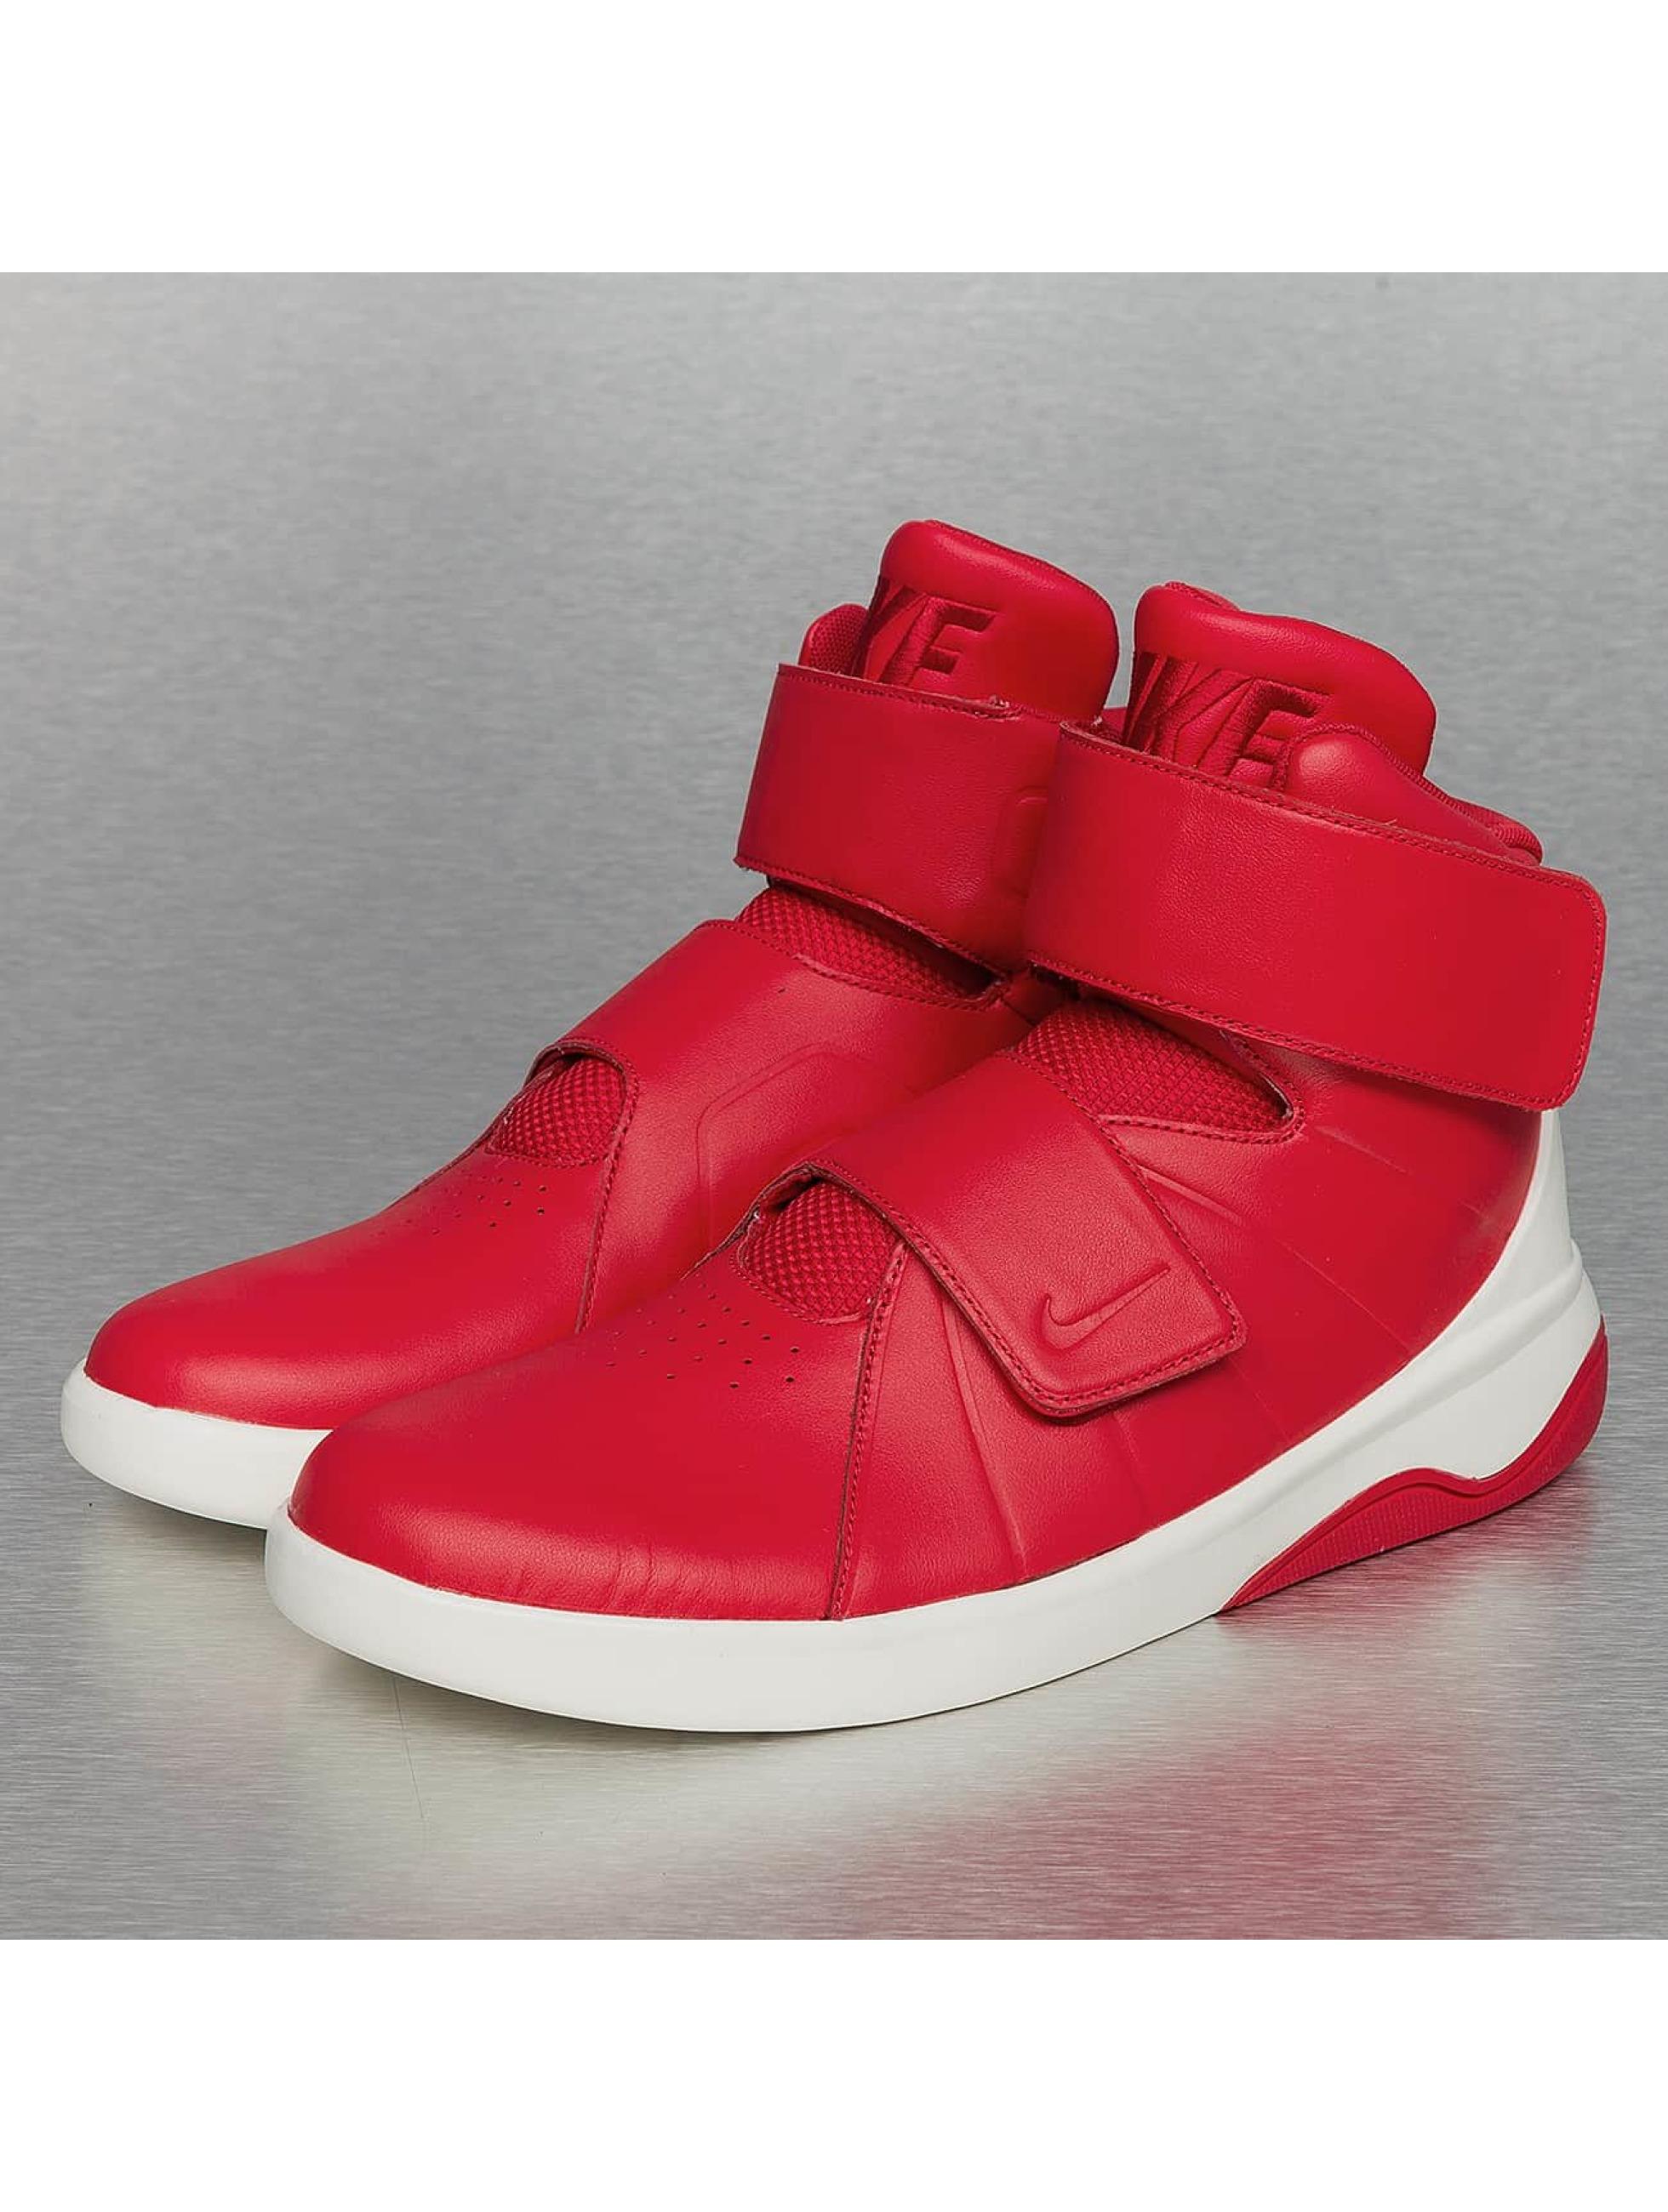 Nike Sneakers Rot